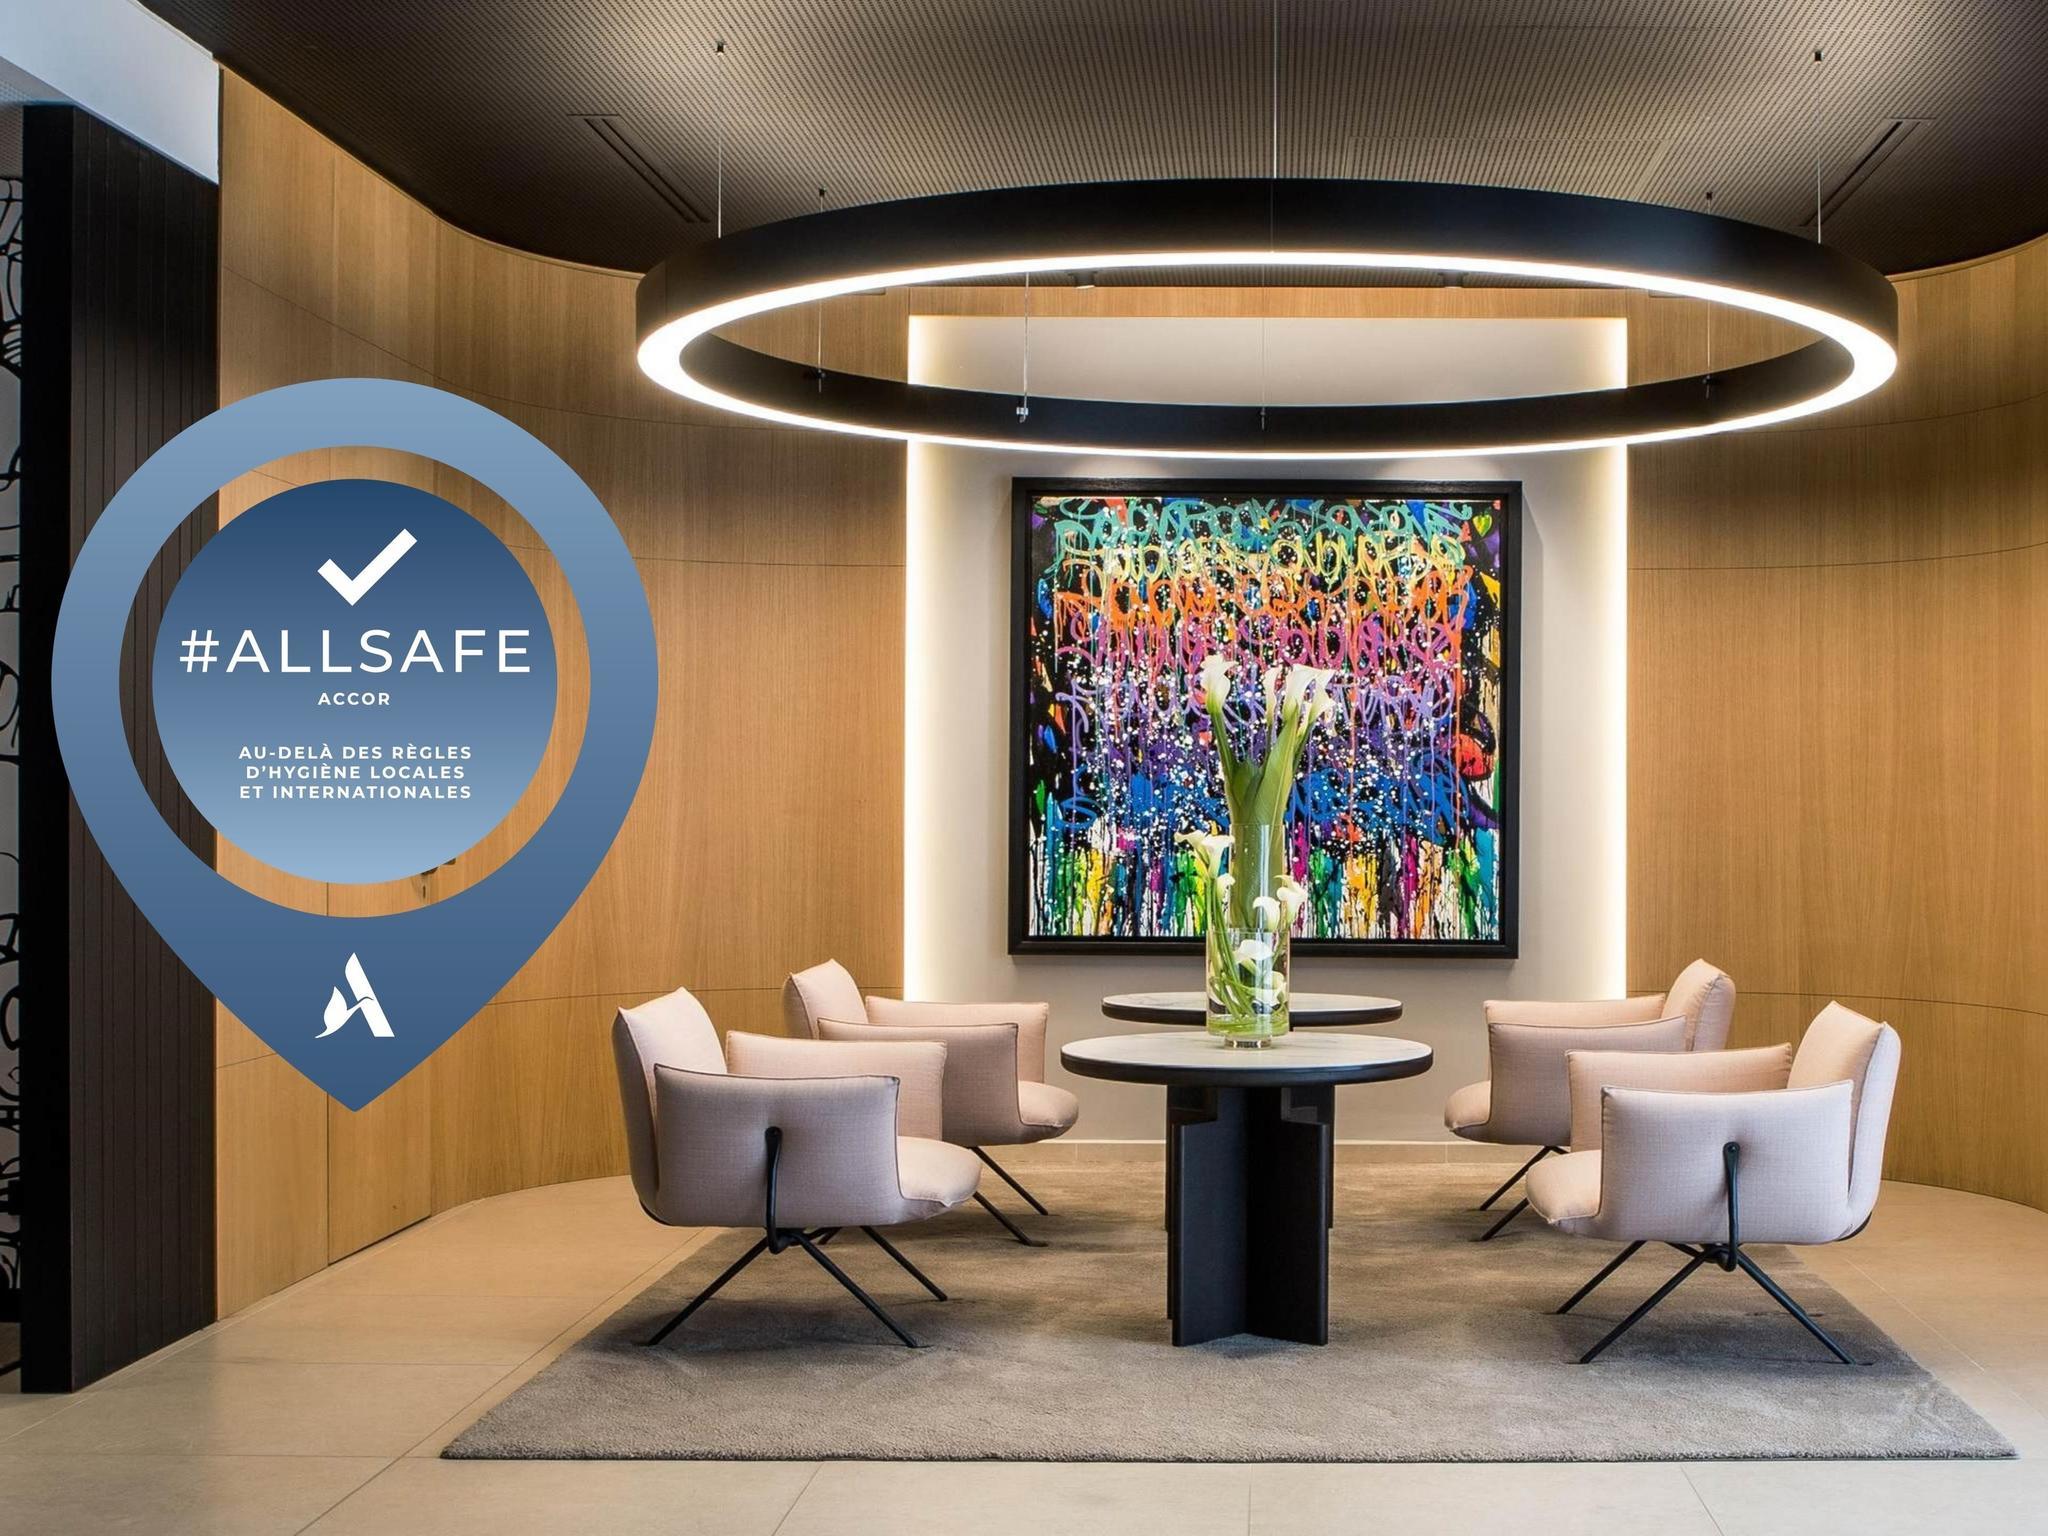 Hotel – Mercure Paris 17 Batignolles (dibuka Mei 2018)